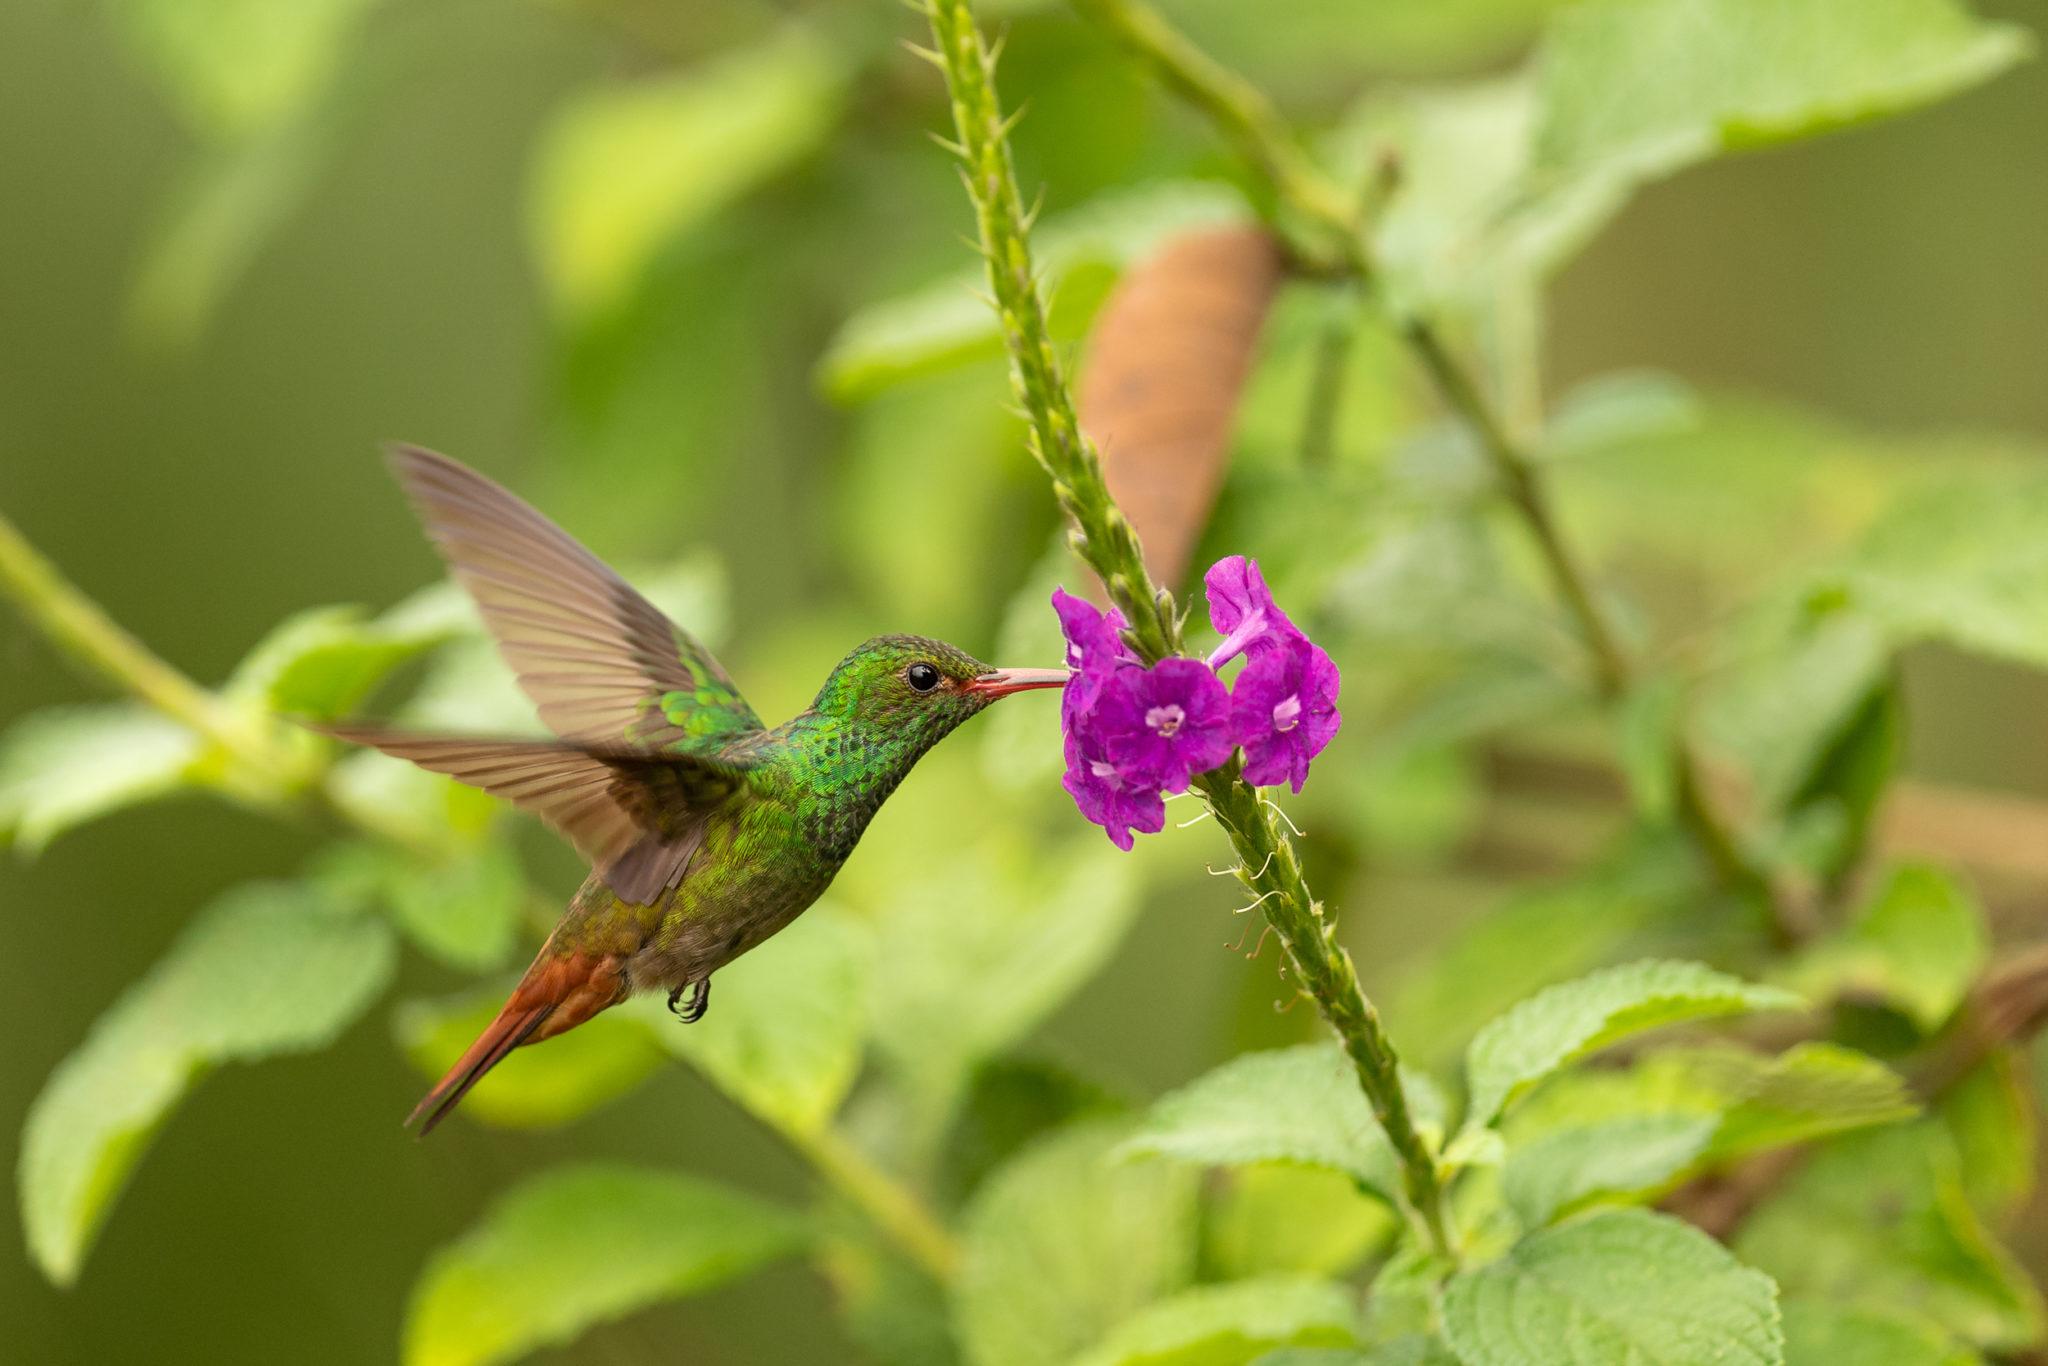 Braunschwanzamazilie oder Rotschwanzkolibri (Amazilia tzacatl)